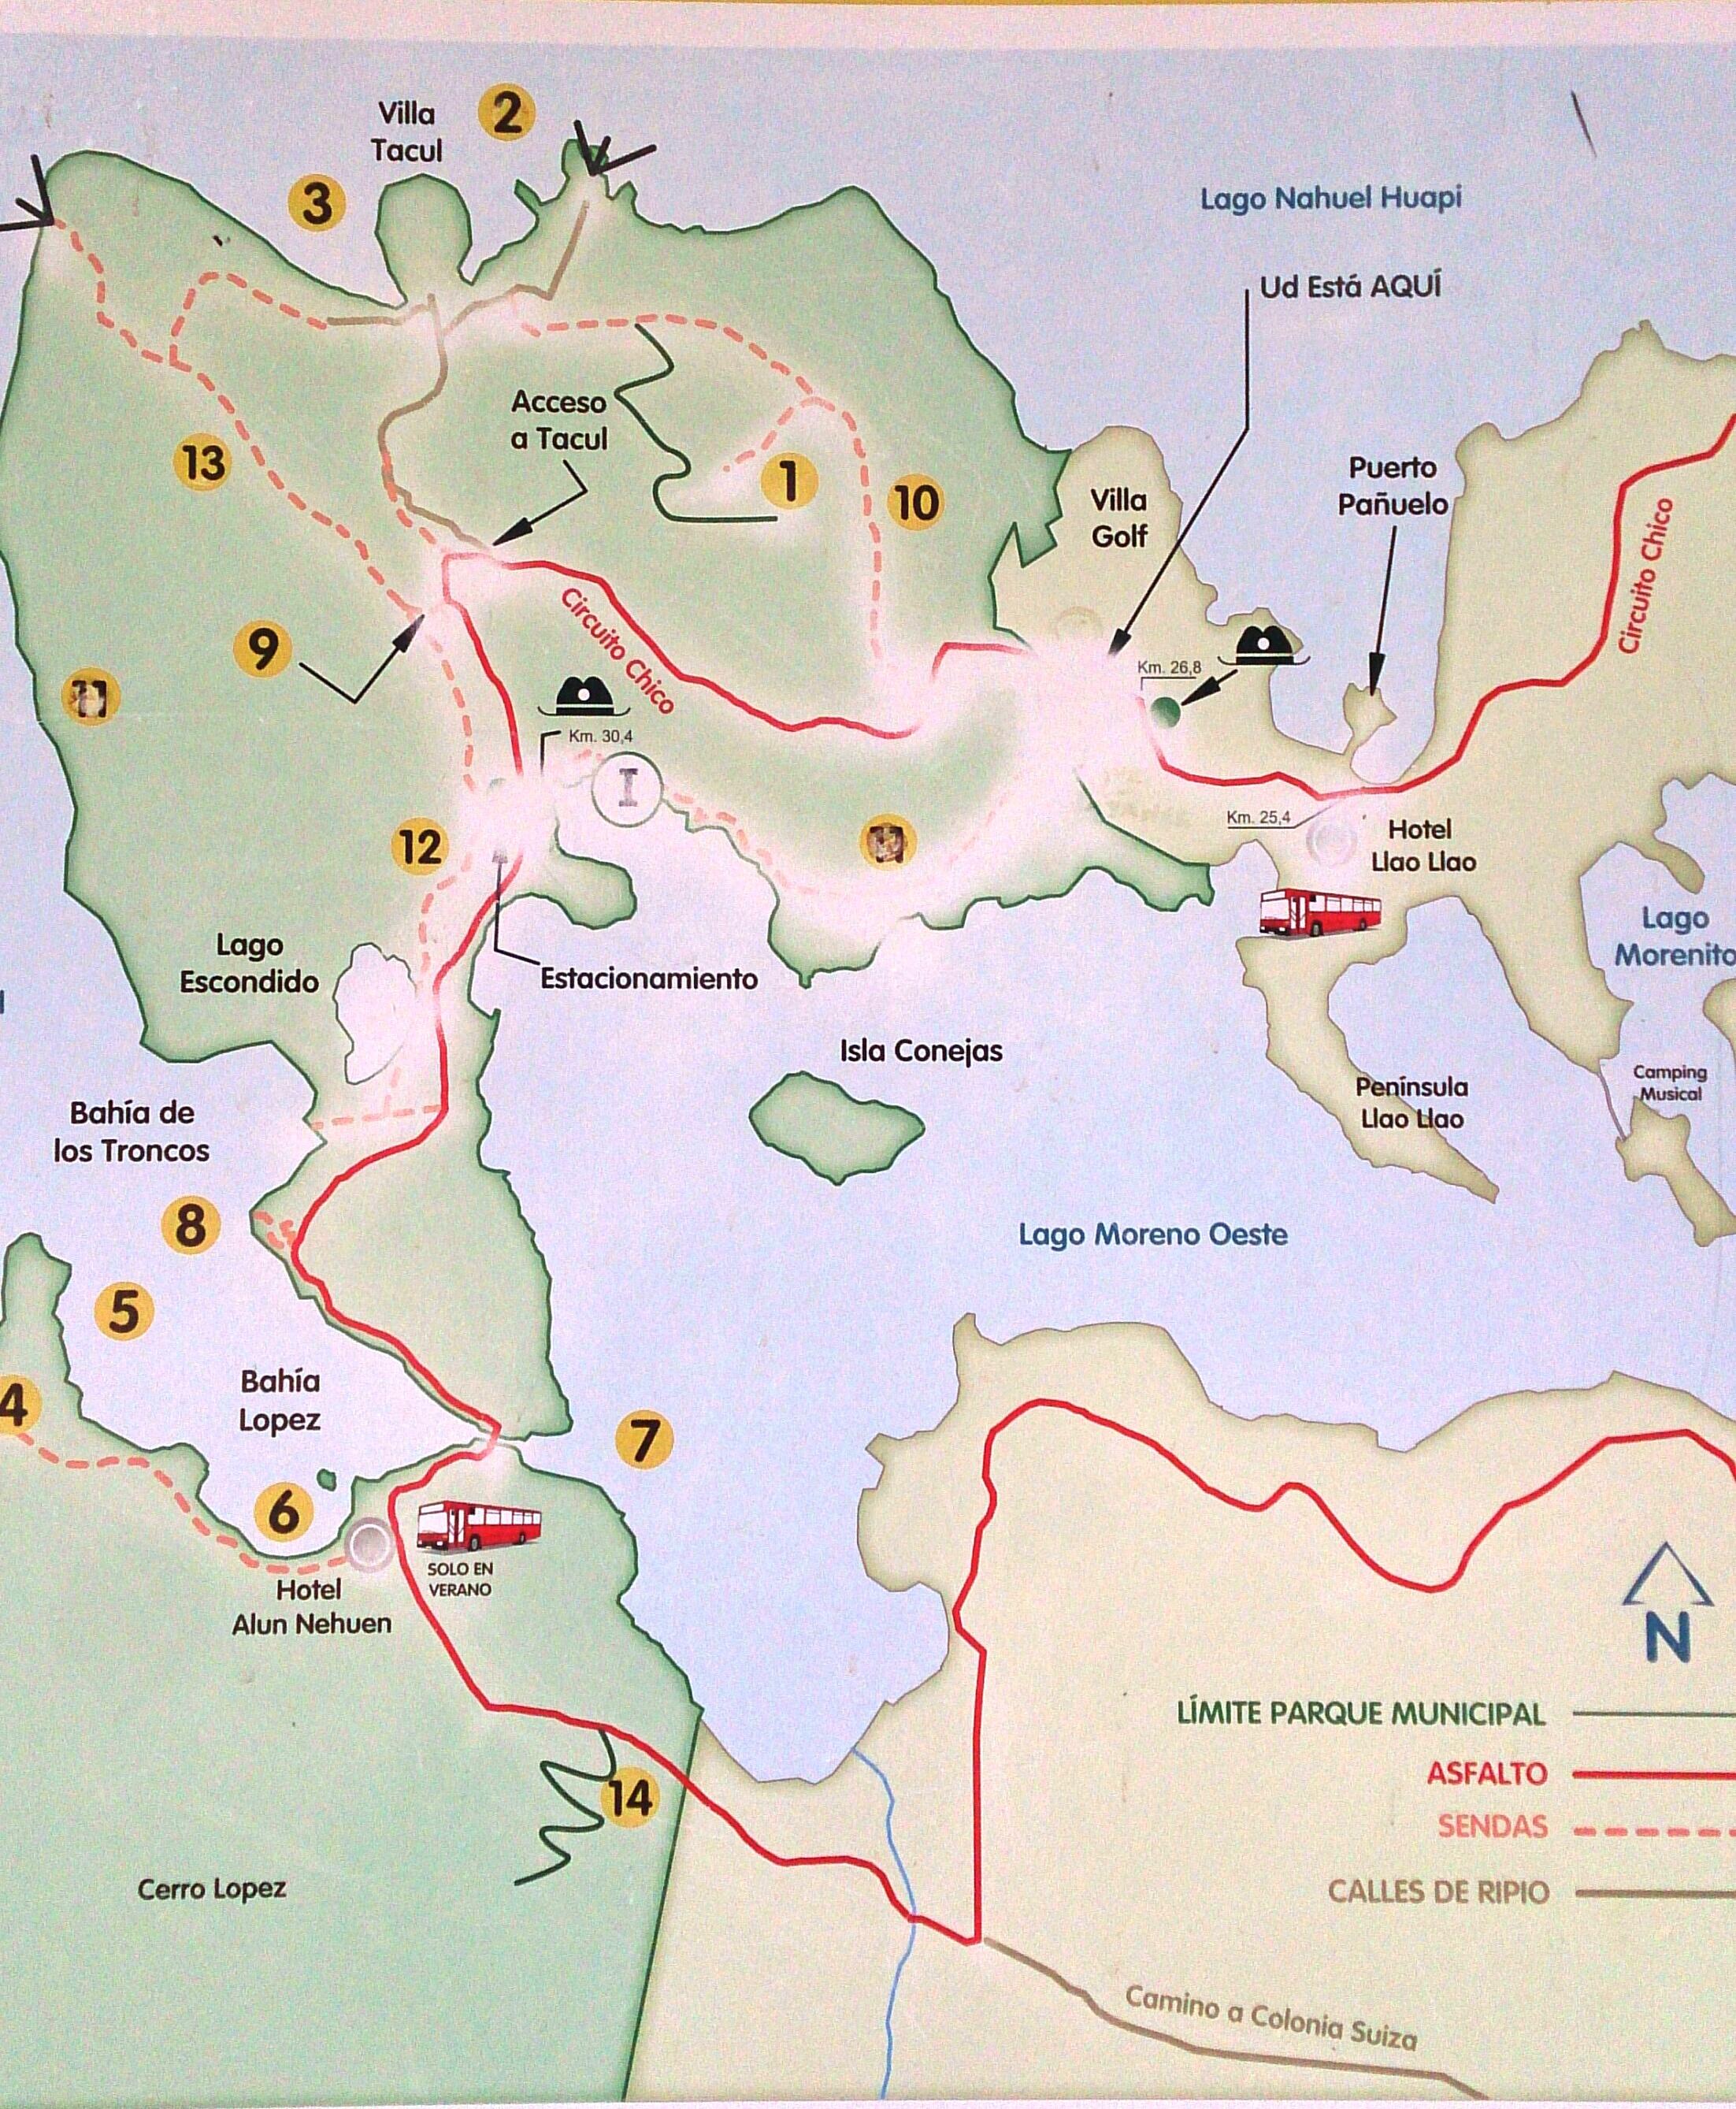 Circuito Grande Bariloche : Un clásico de bariloche u recorriendo circuito chico